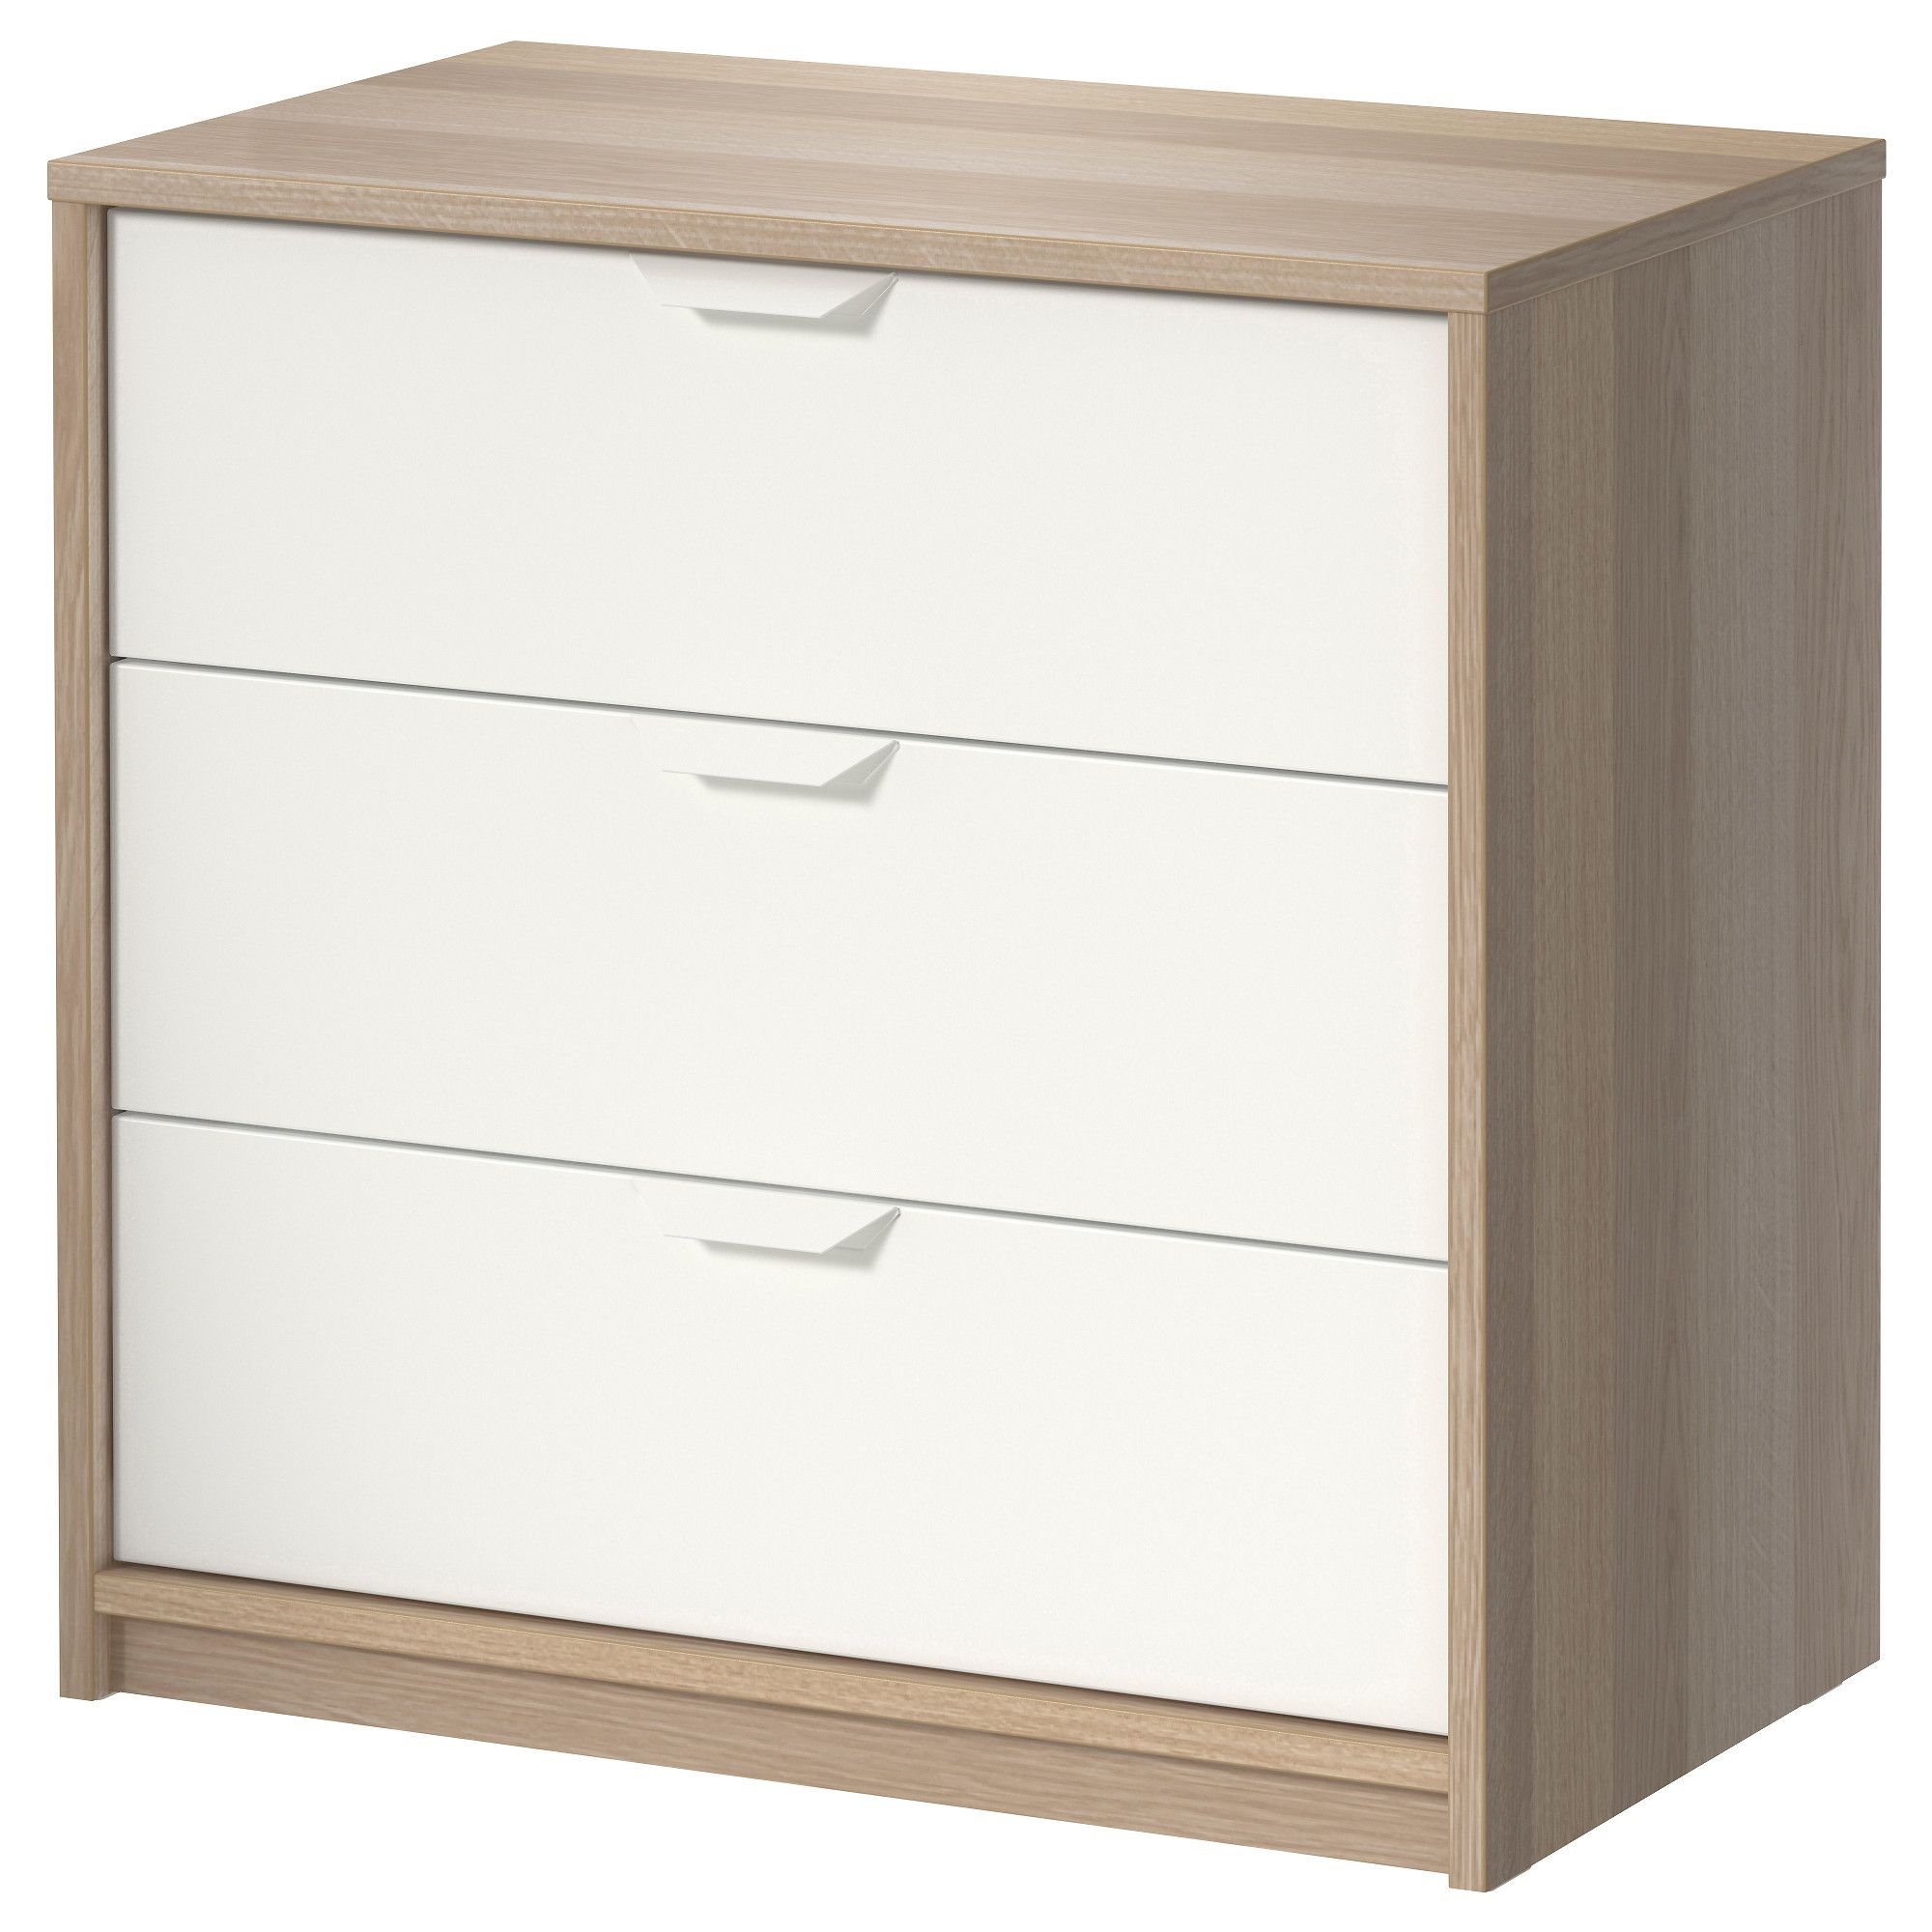 Cheap askvoll cmoda de cajones efecto roble tinte ikea with commode hemnes ikea 6 tiroirs - Ikea commode hemnes 6 tiroirs ...